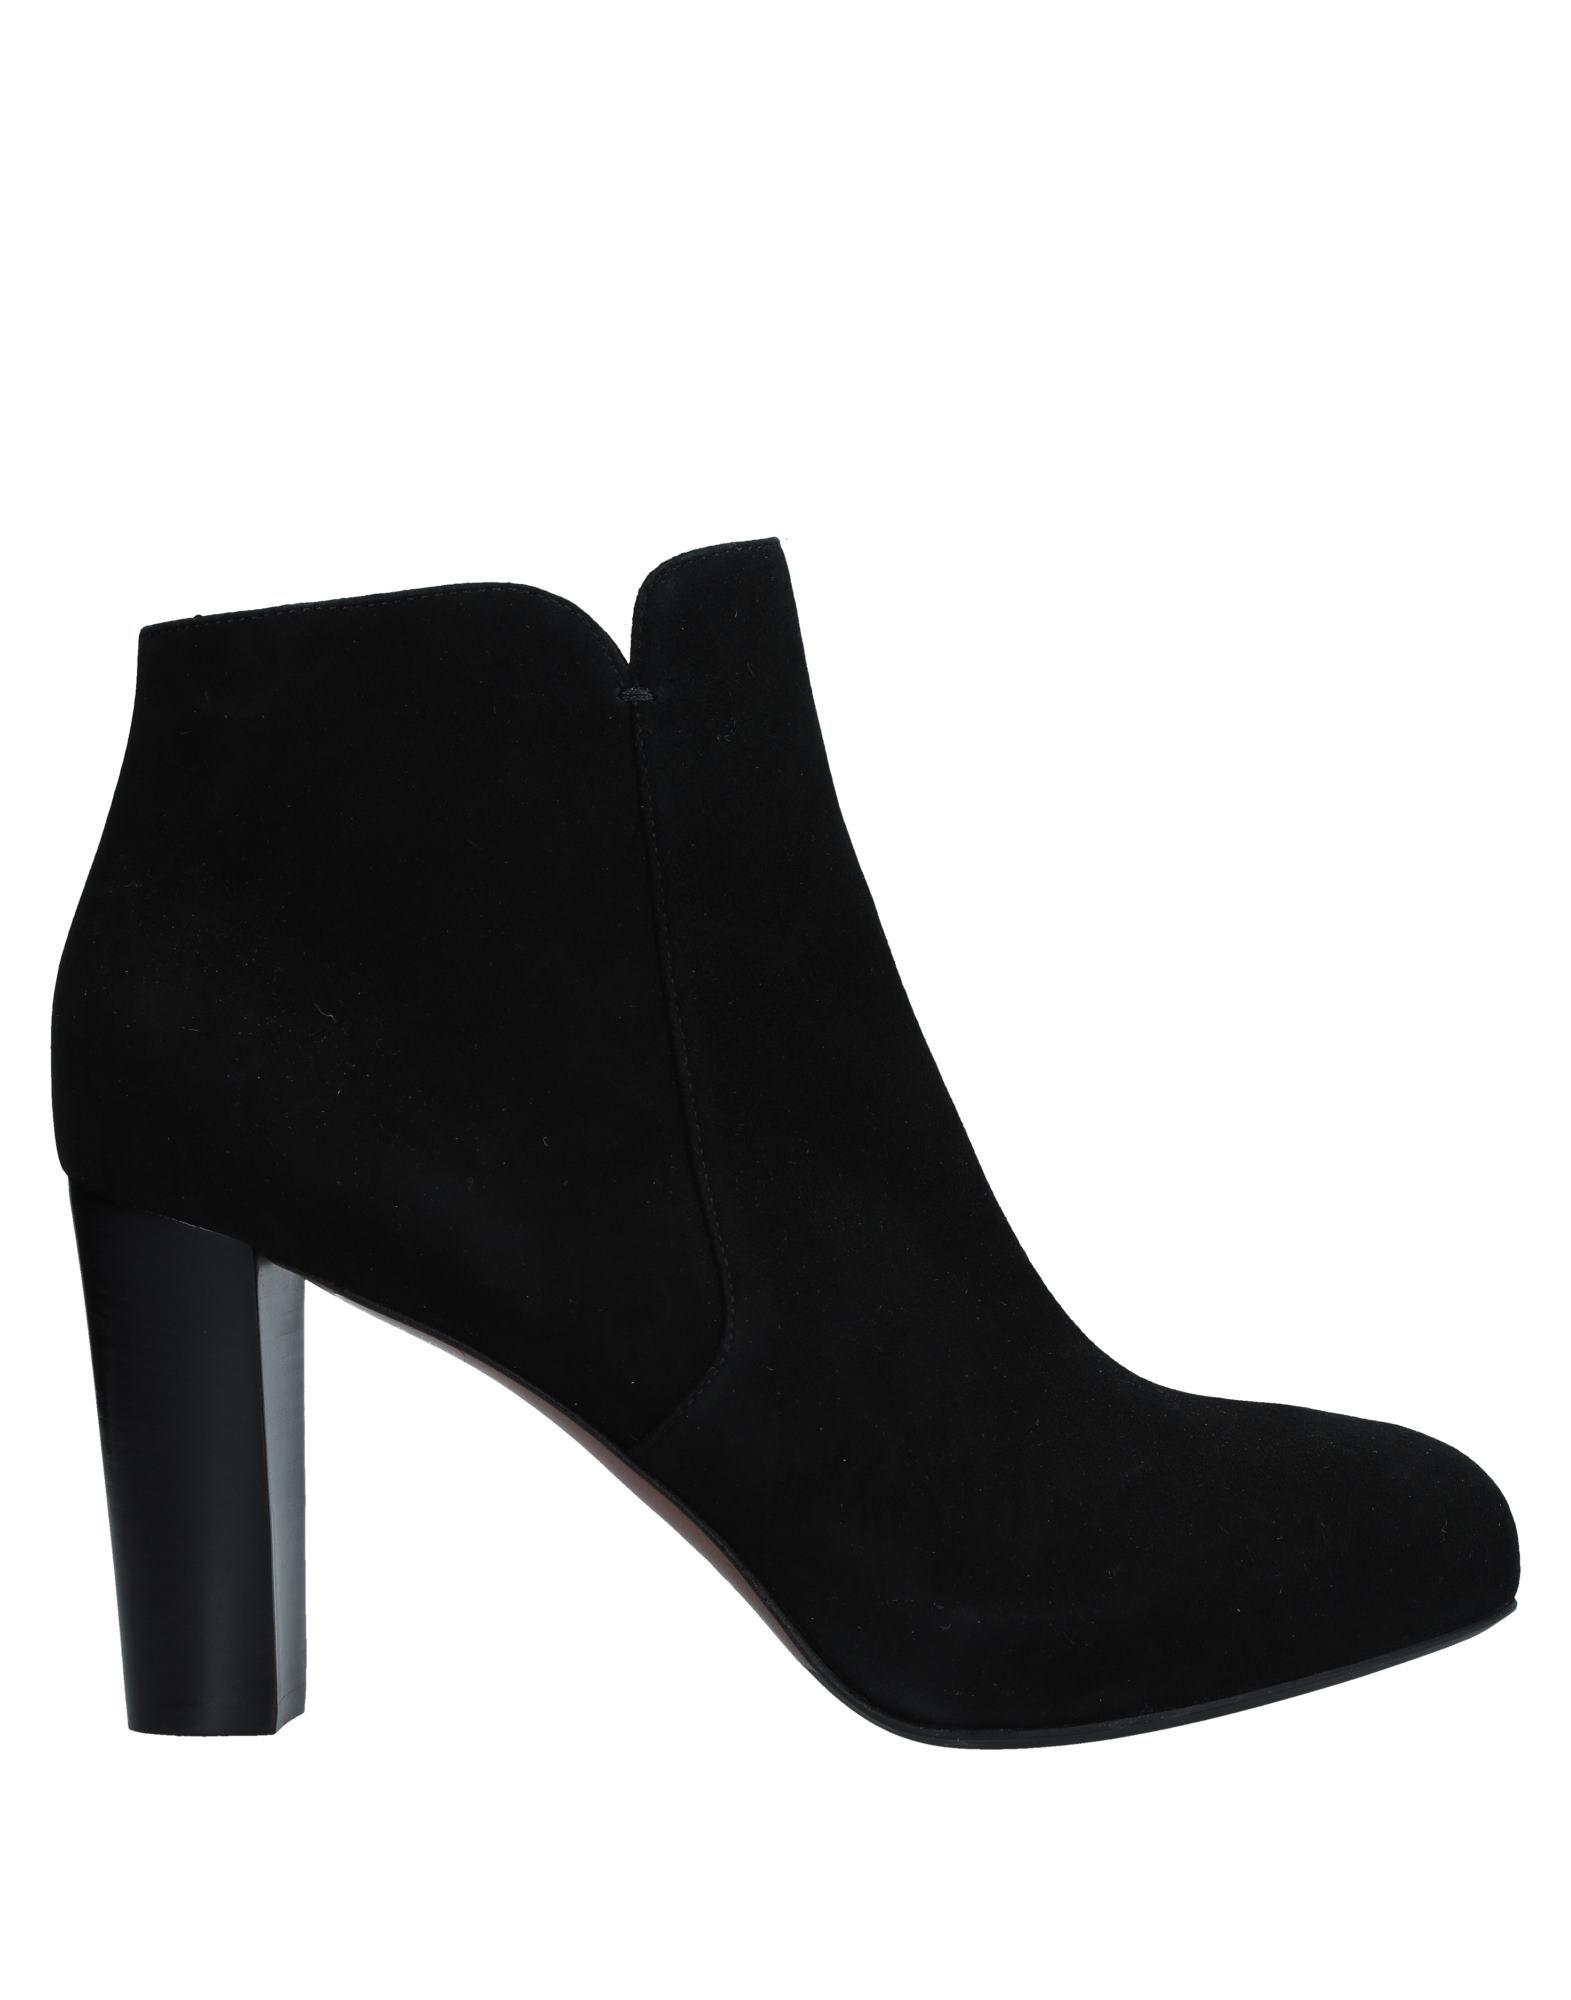 Lella Baldi Stiefelette Damen  11535530ABGut aussehende aussehende aussehende strapazierfähige Schuhe d4f3cb